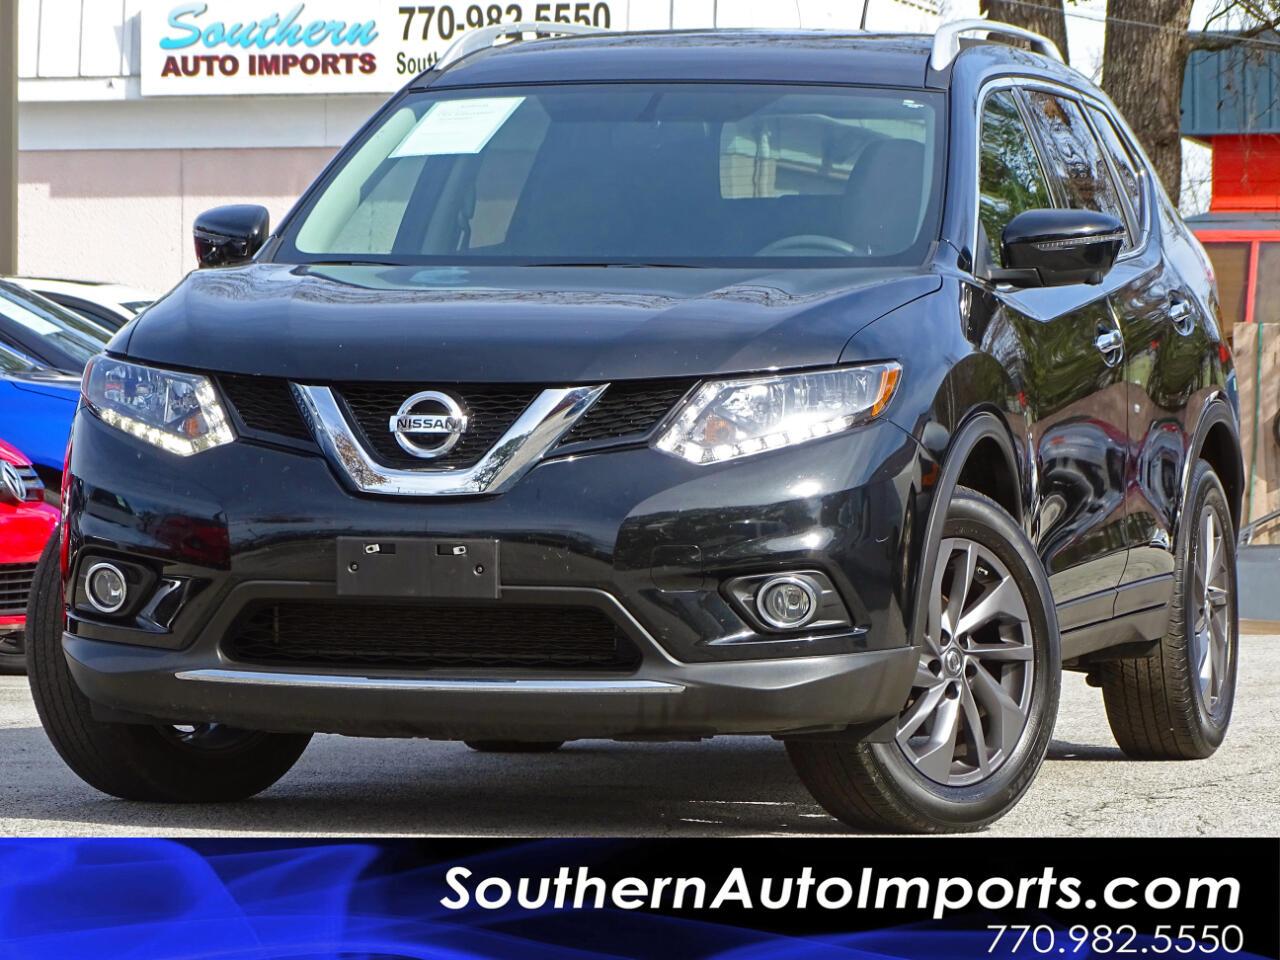 2016 Nissan Rogue SL AWDw/Back up Camera Navigation system